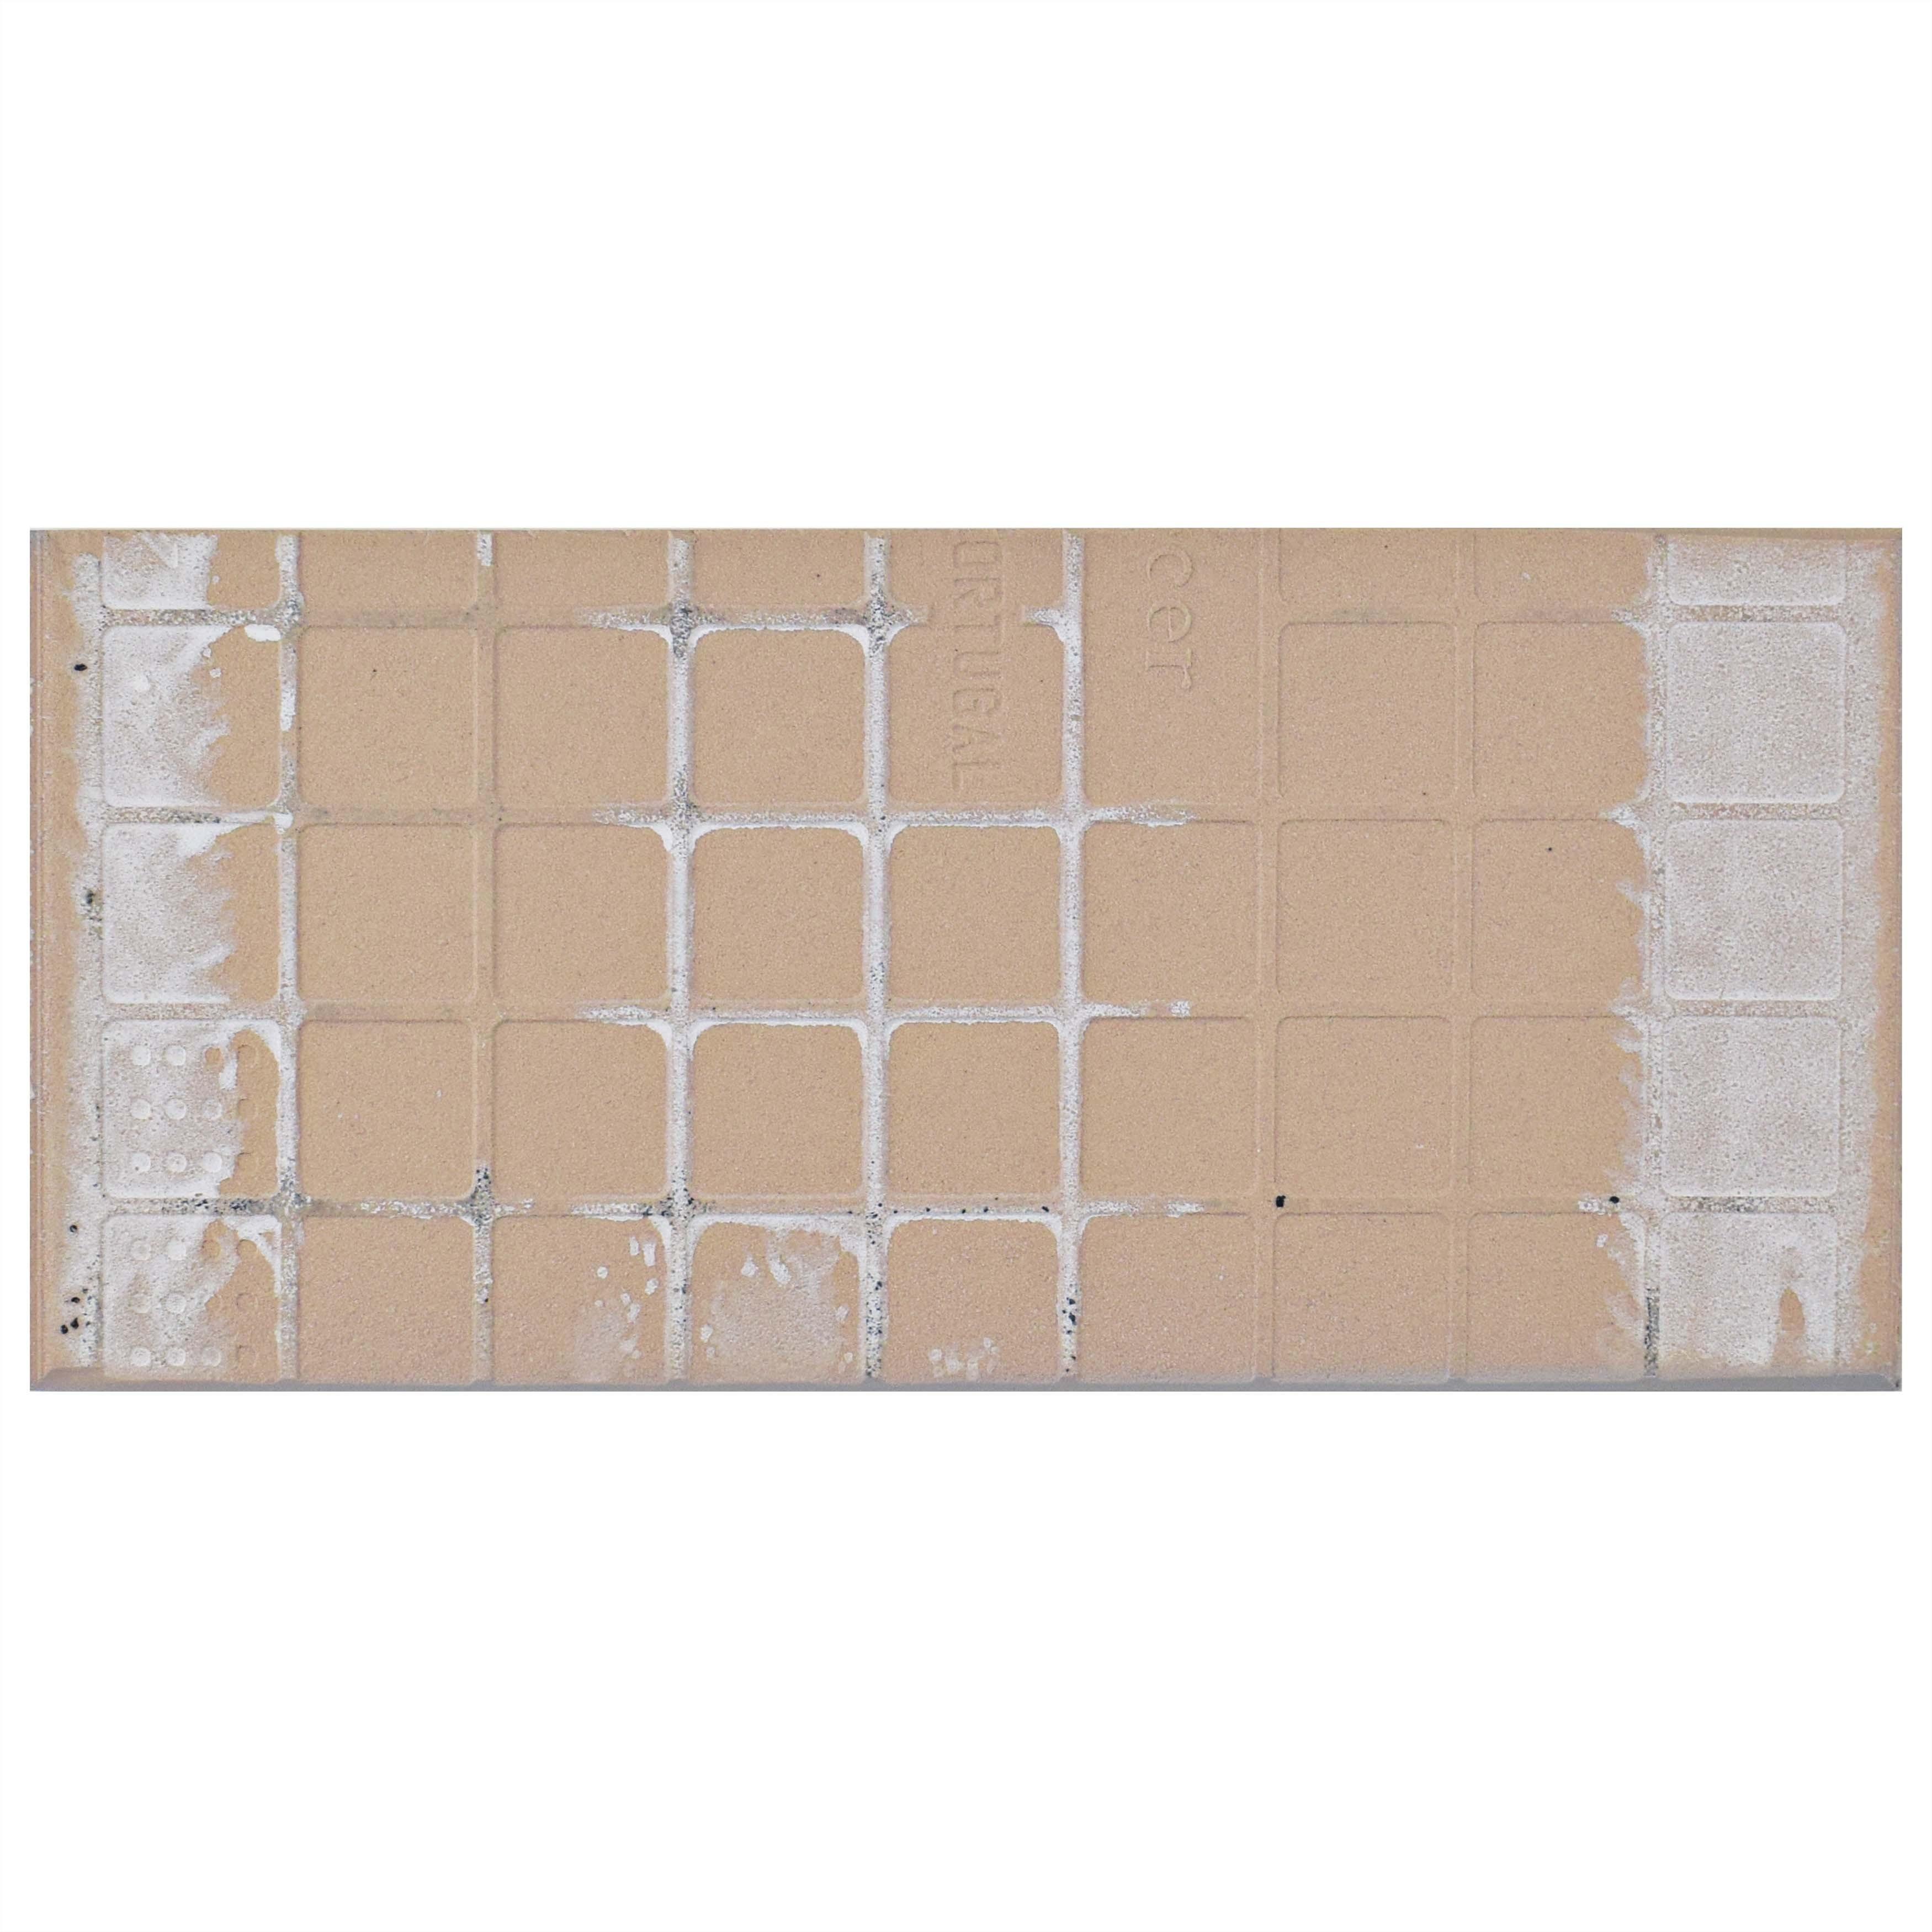 Shop Somertile 35x775 Inch Thirties Grey Ceramic Bullnose Floor